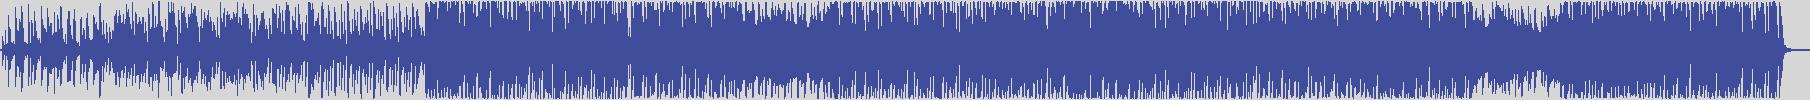 gold_hit_records [GHR002] Lucas Castro - Sole D'estate [Radio Edit] audio wave form